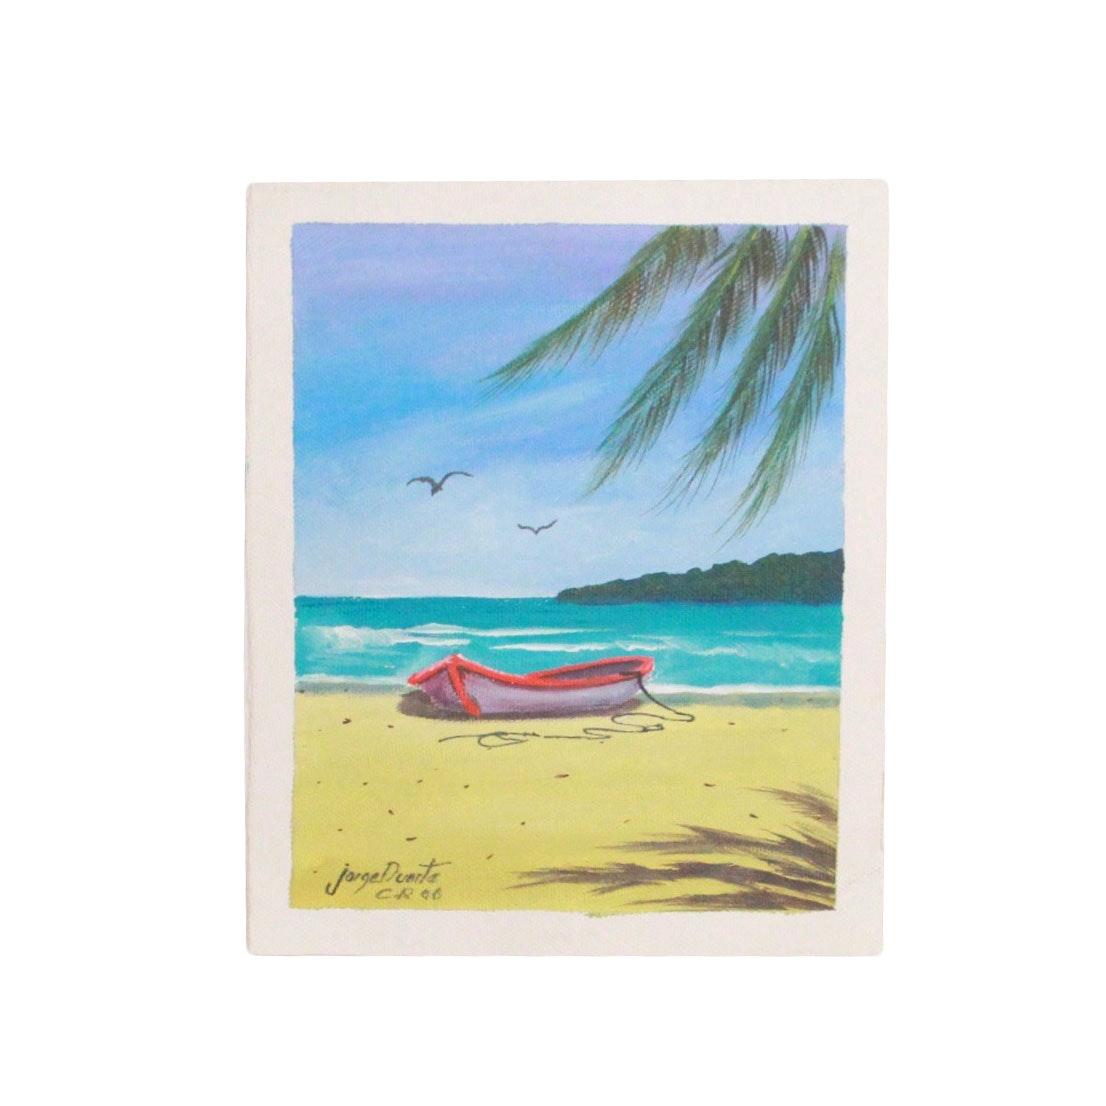 Jorge Duarte 1990s Acrylic on Canvas of Tropical Maritime Scene